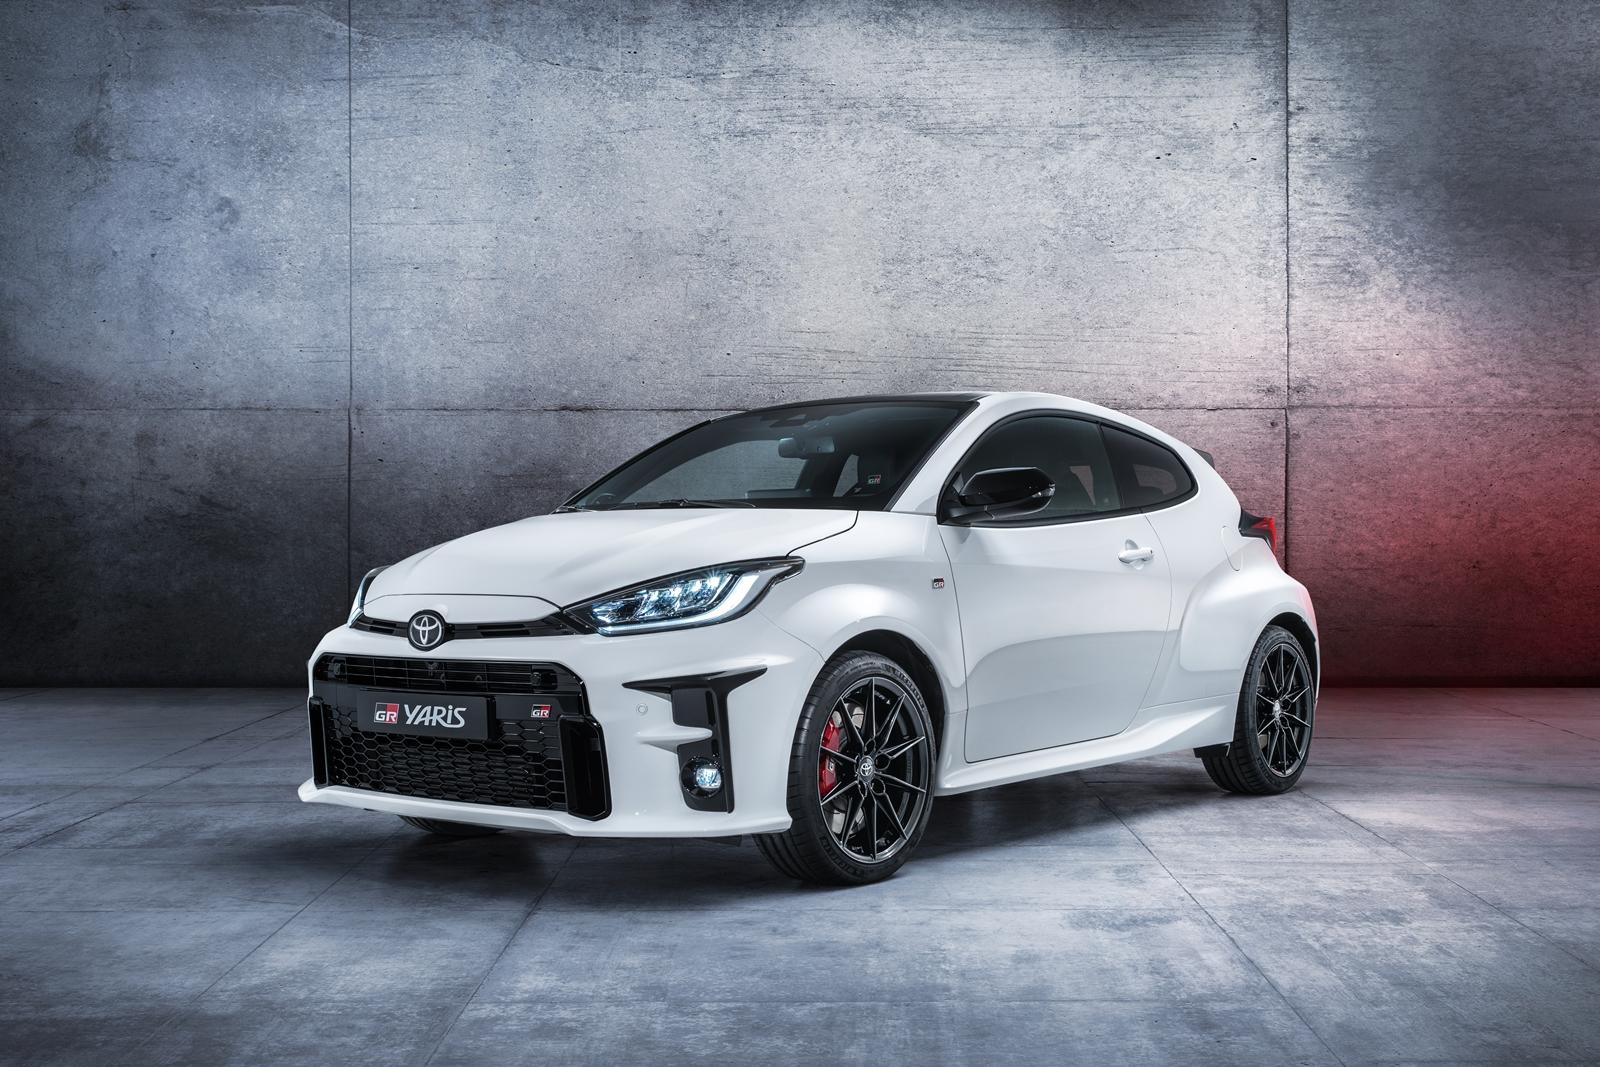 Toyota Gr Yaris (8)